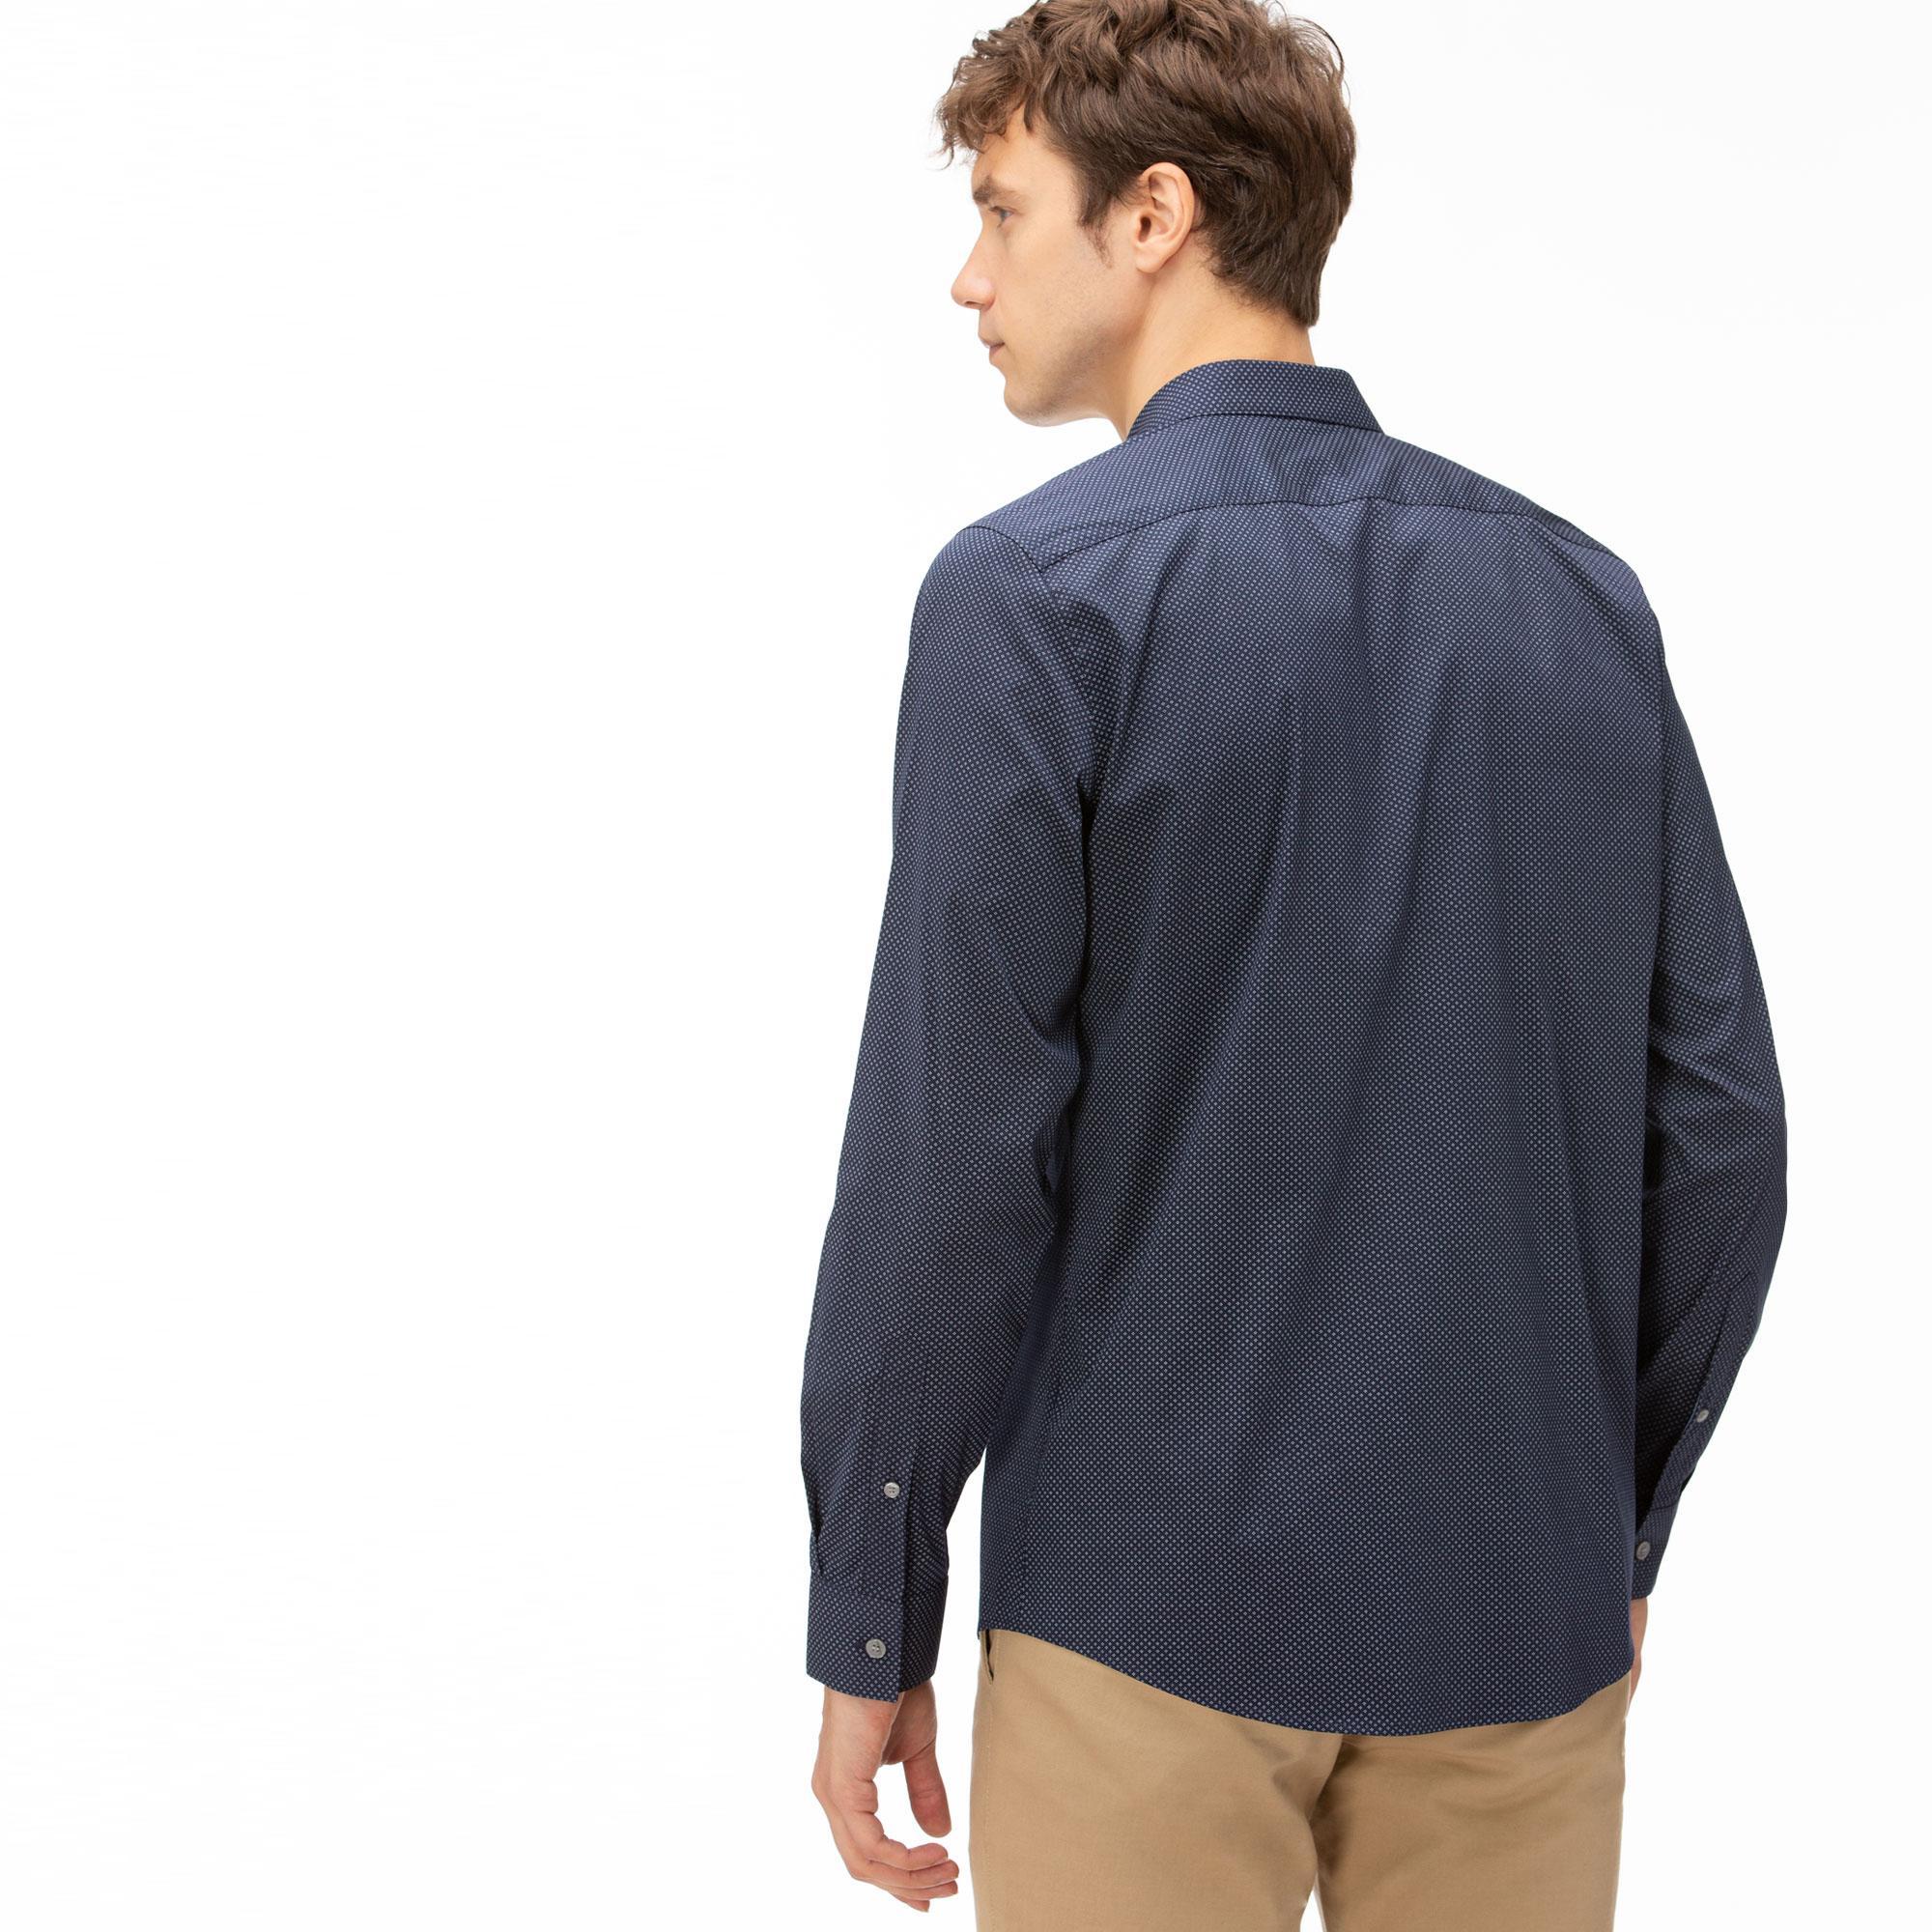 Lacoste Men's Slim Fit Mini Patterned Stretch Poplin Shirt